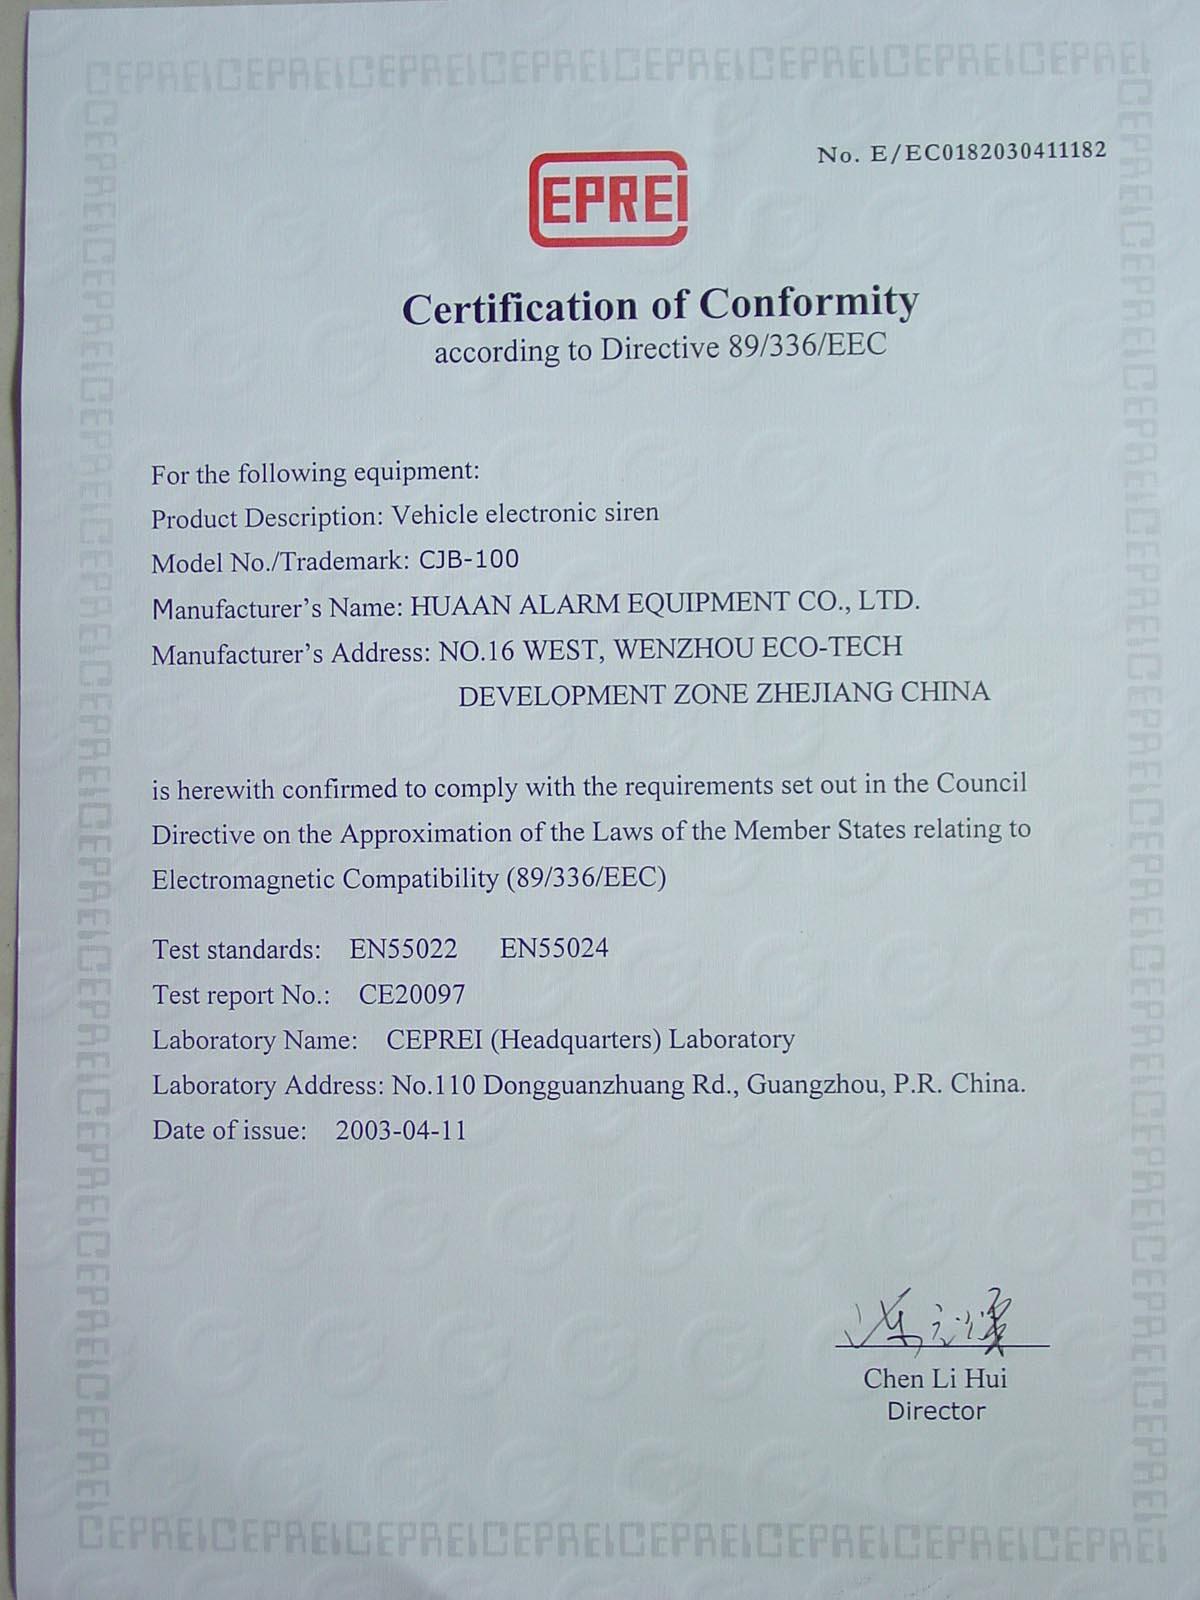 Siren CE certificate